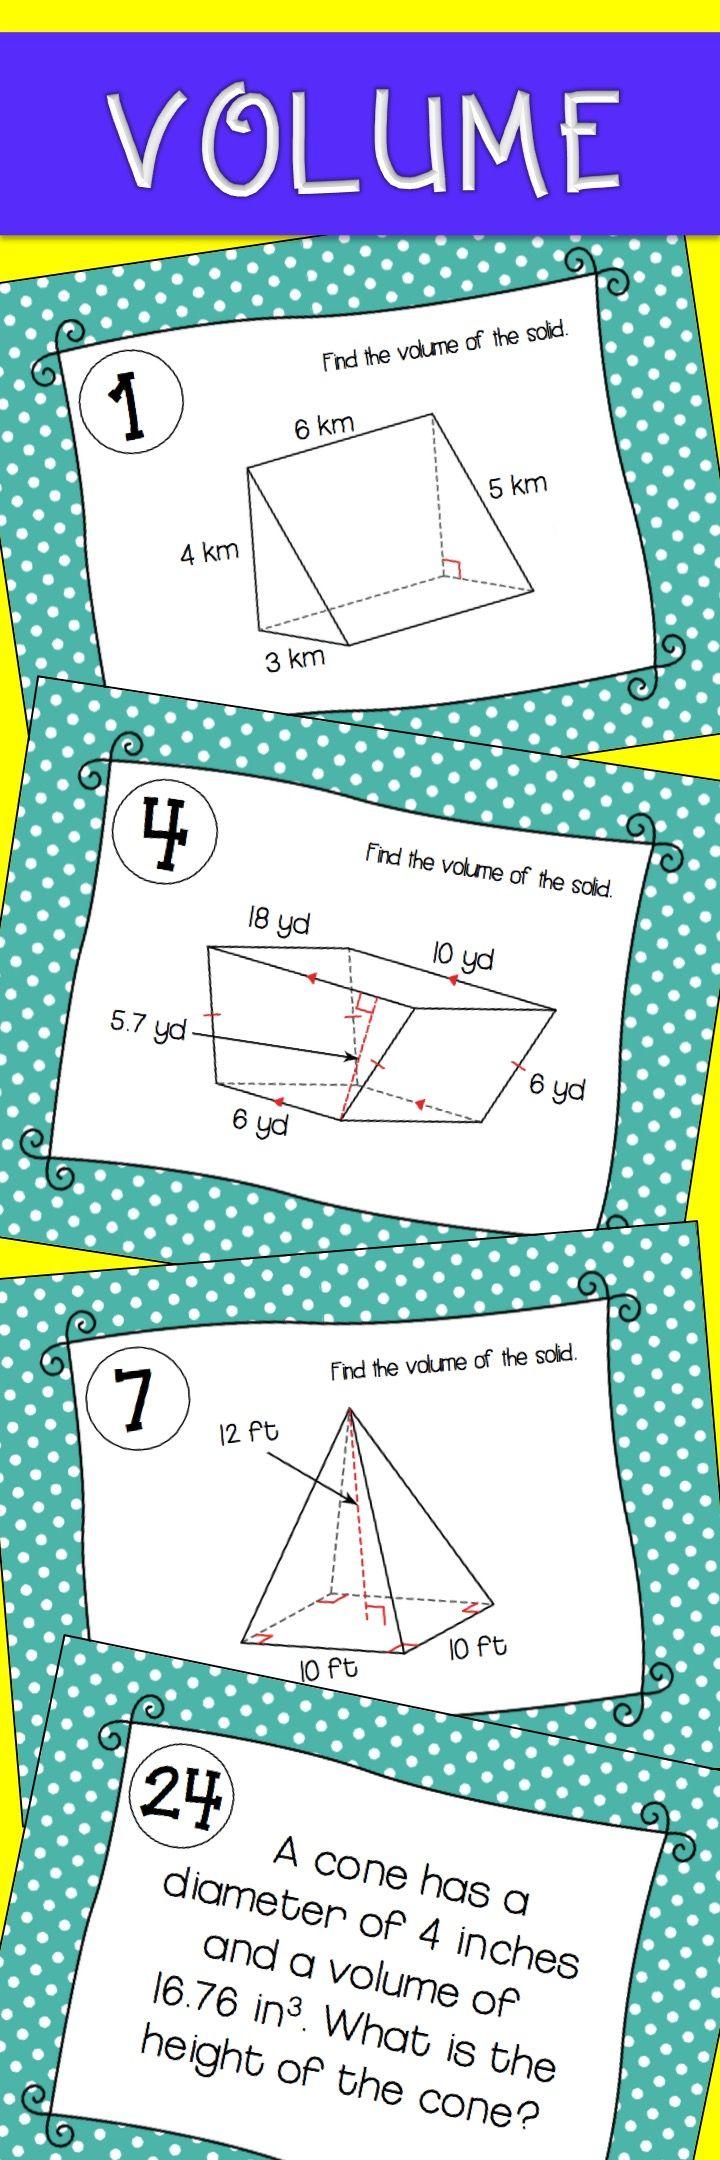 Volume Activity for High School Geometry - Volume Task Cards